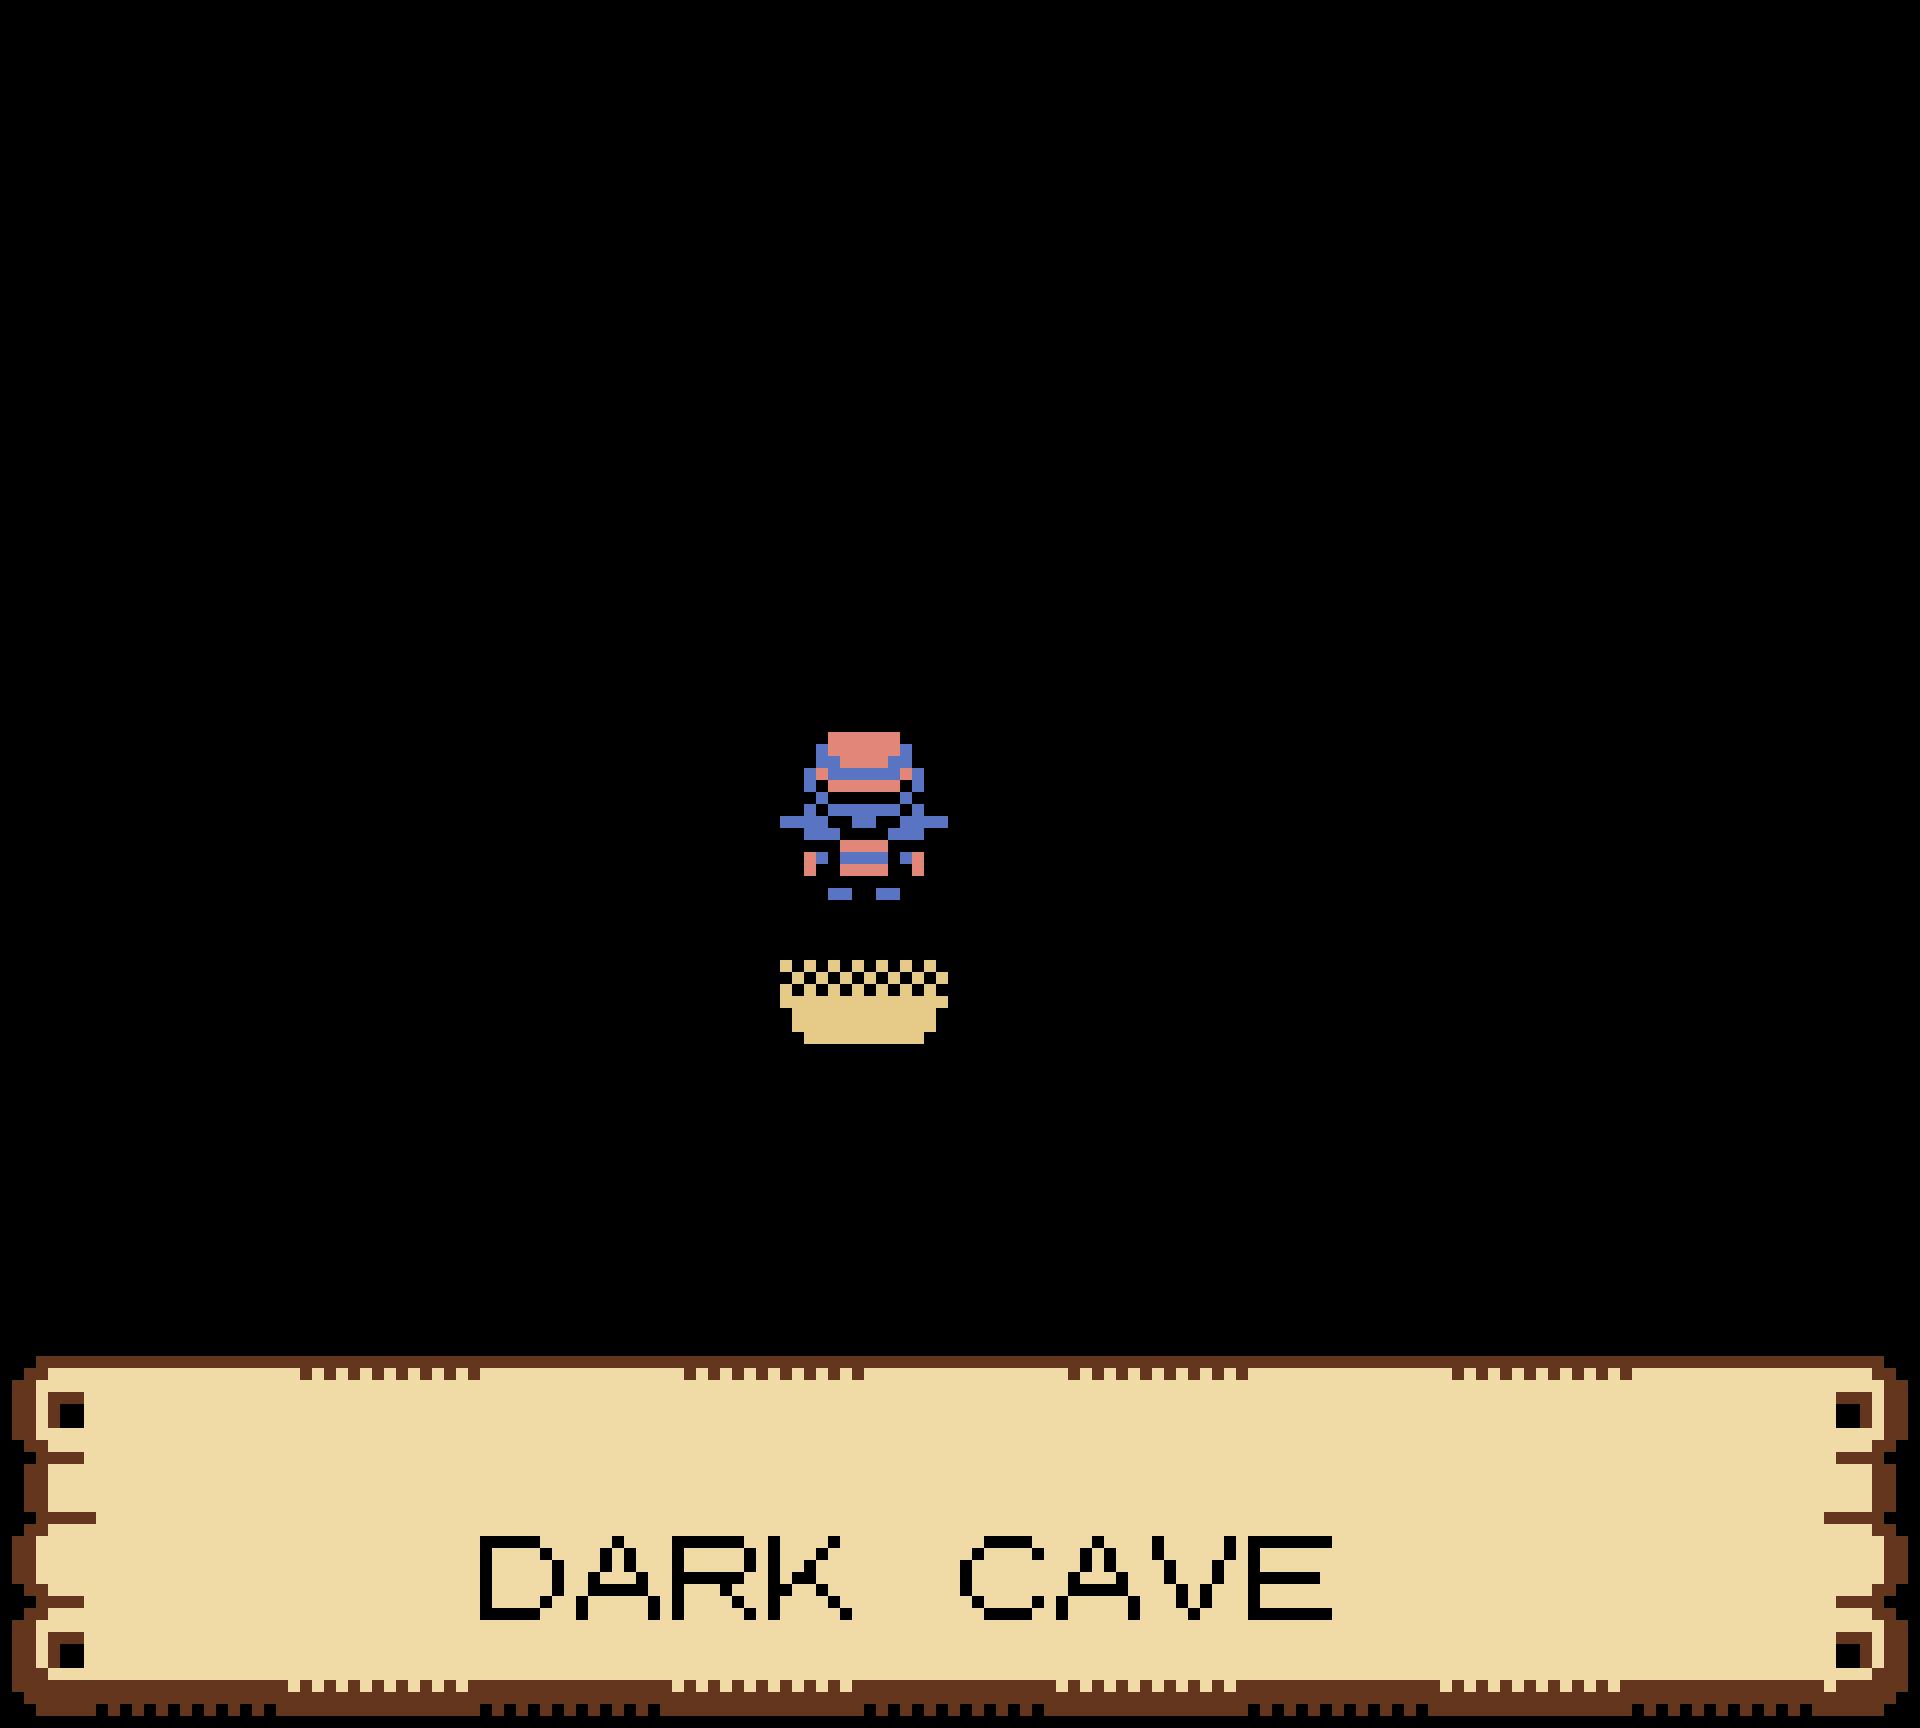 Pokemon_Crystal_Nuzlocke_2021-10-14_19.33.06.png